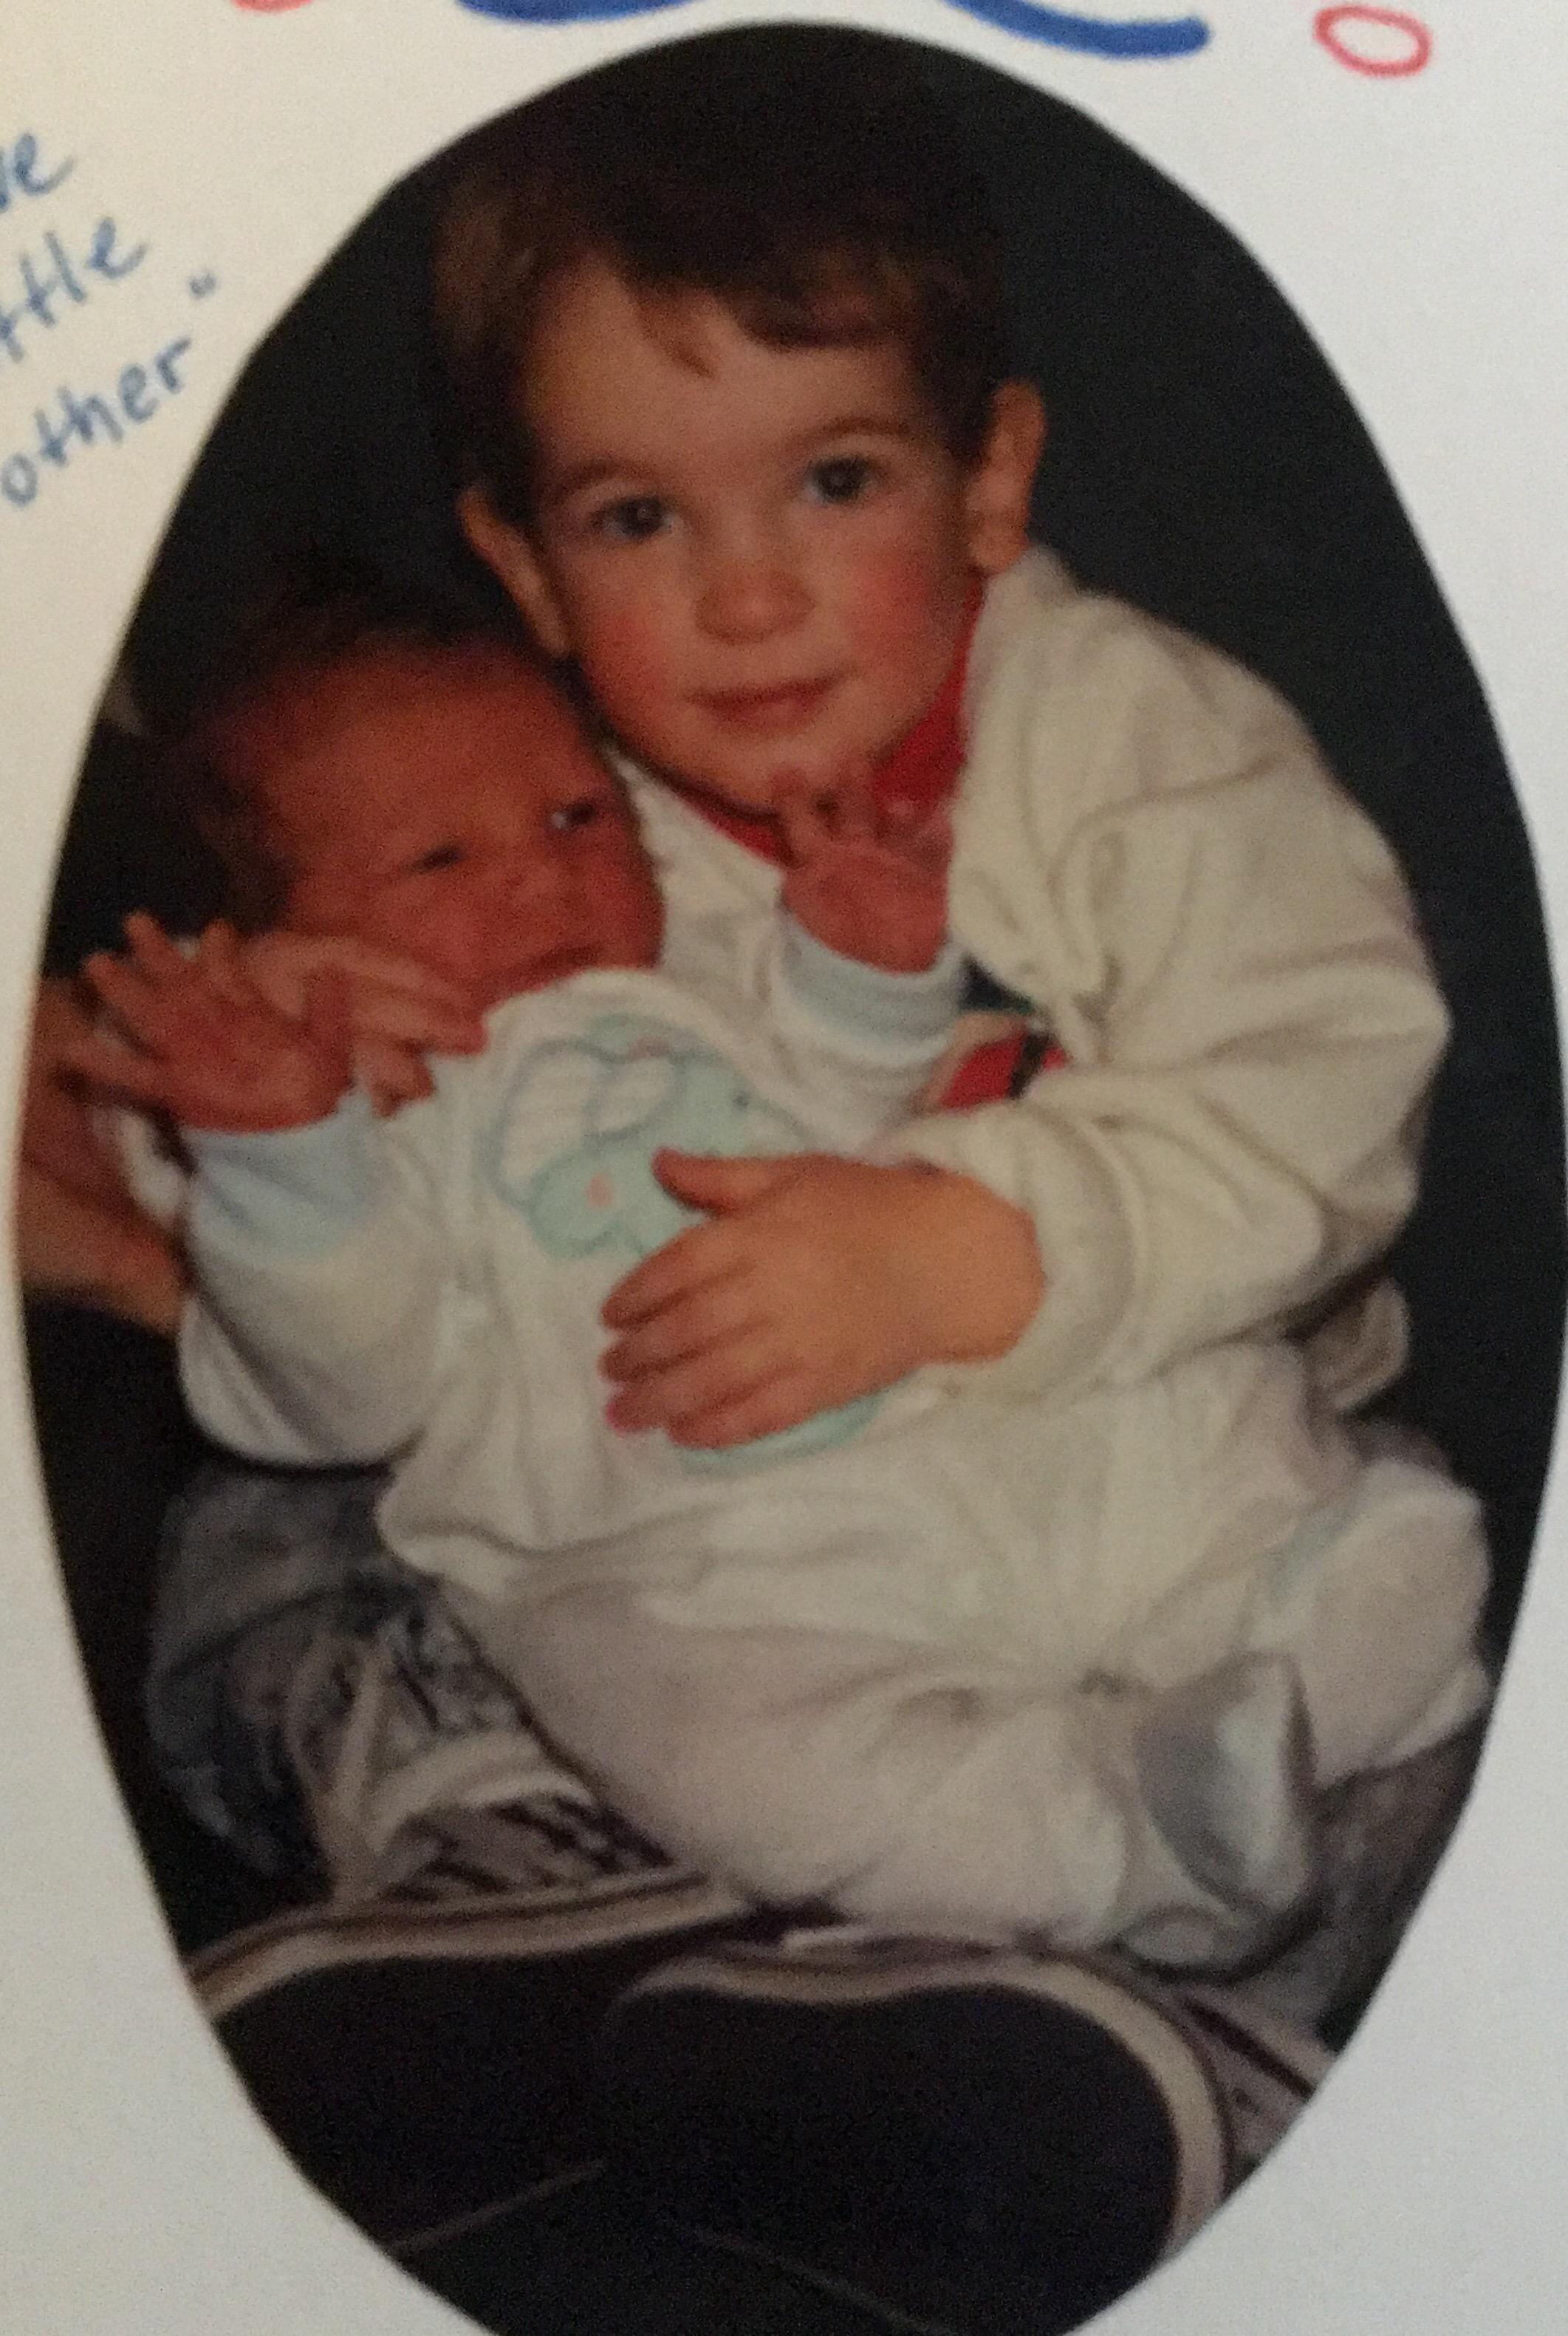 Jared_&_baby_Seth.jpg